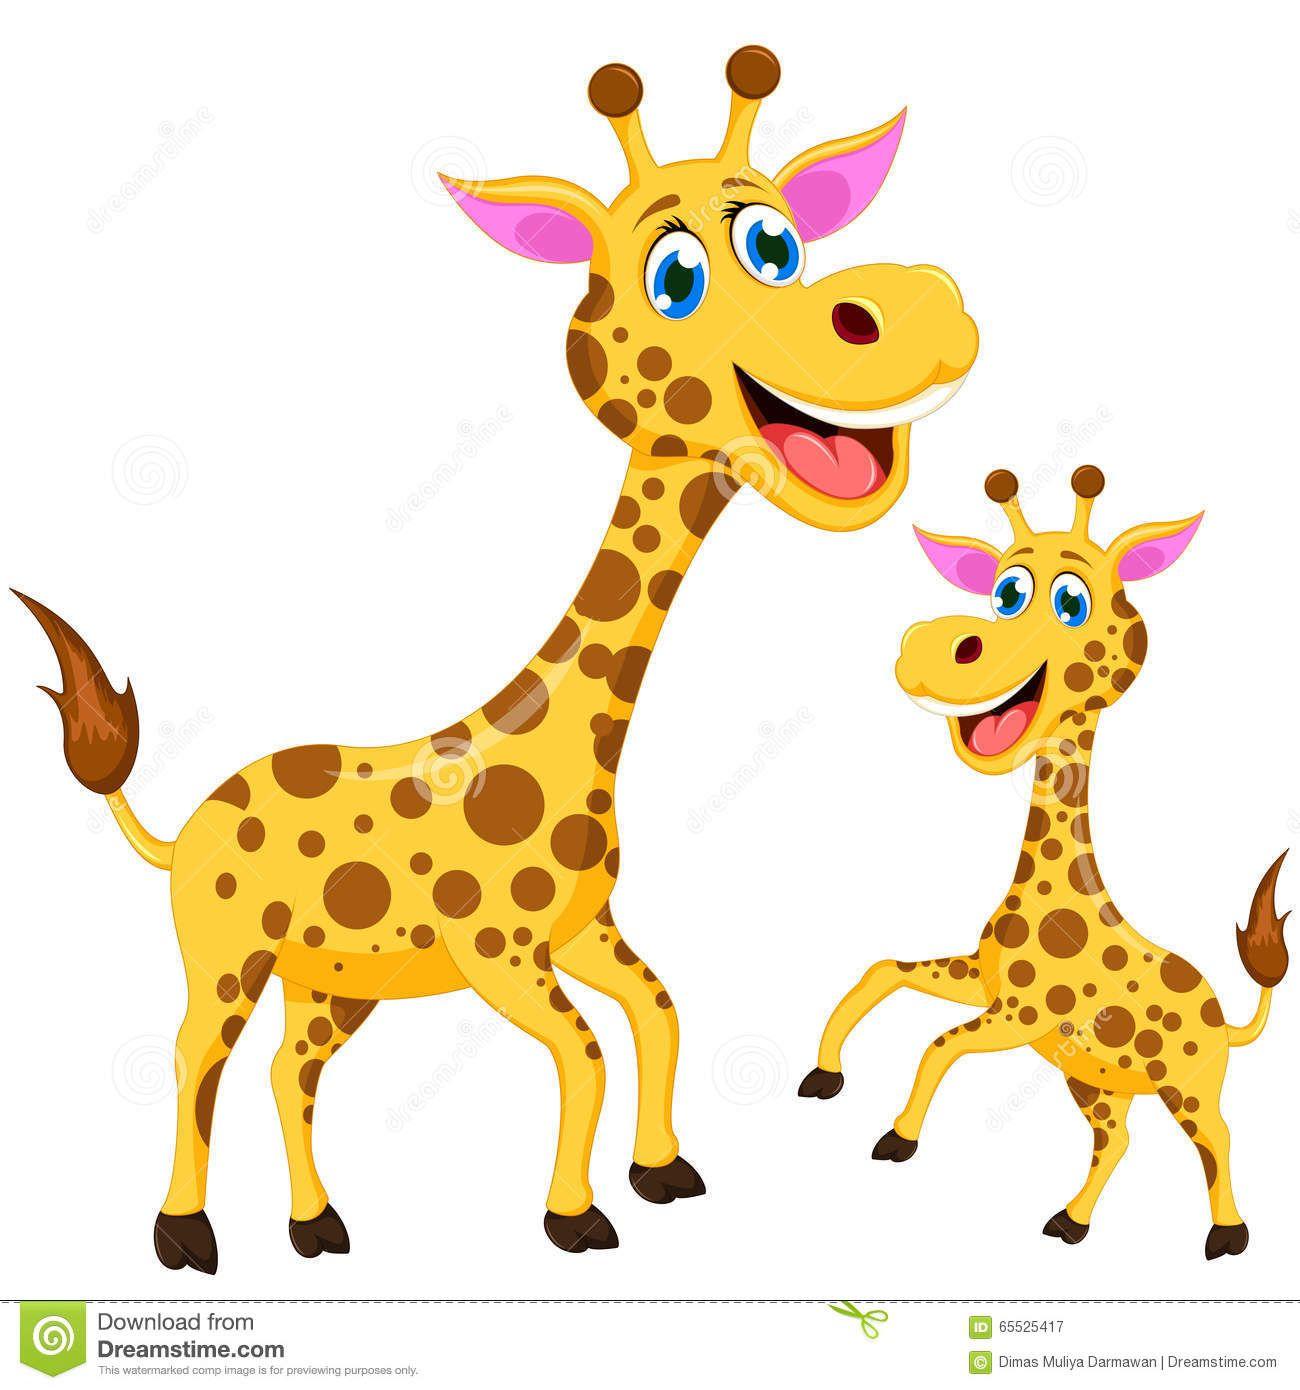 Illustration About Illustration Of Happy Cartoon Giraffe Illustration Of Character African Funny 65525417 Cartoon Giraffe Giraffe Giraffe Illustration